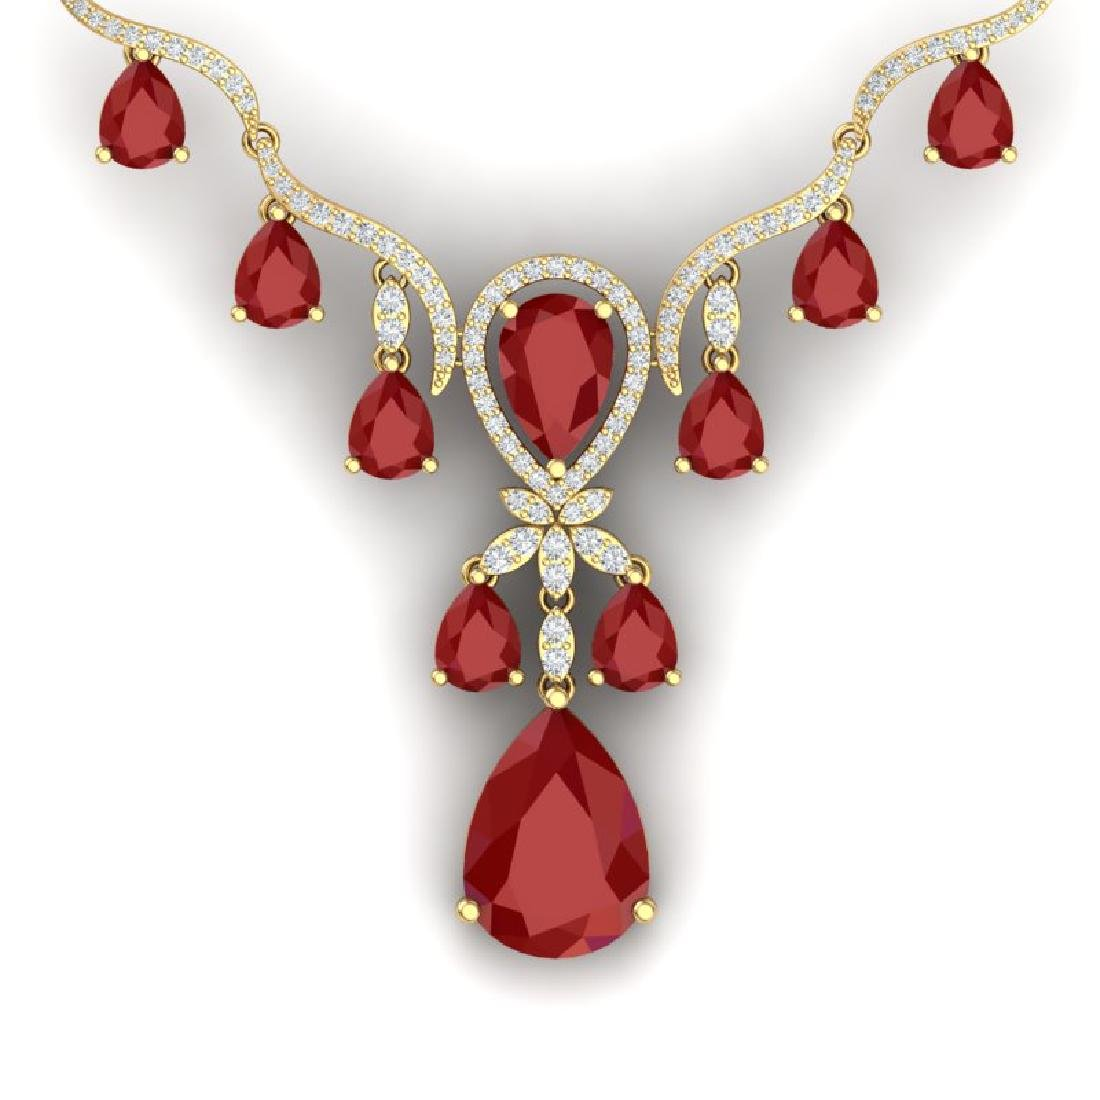 36.14 CTW Royalty Ruby & VS Diamond Necklace 18K Yellow